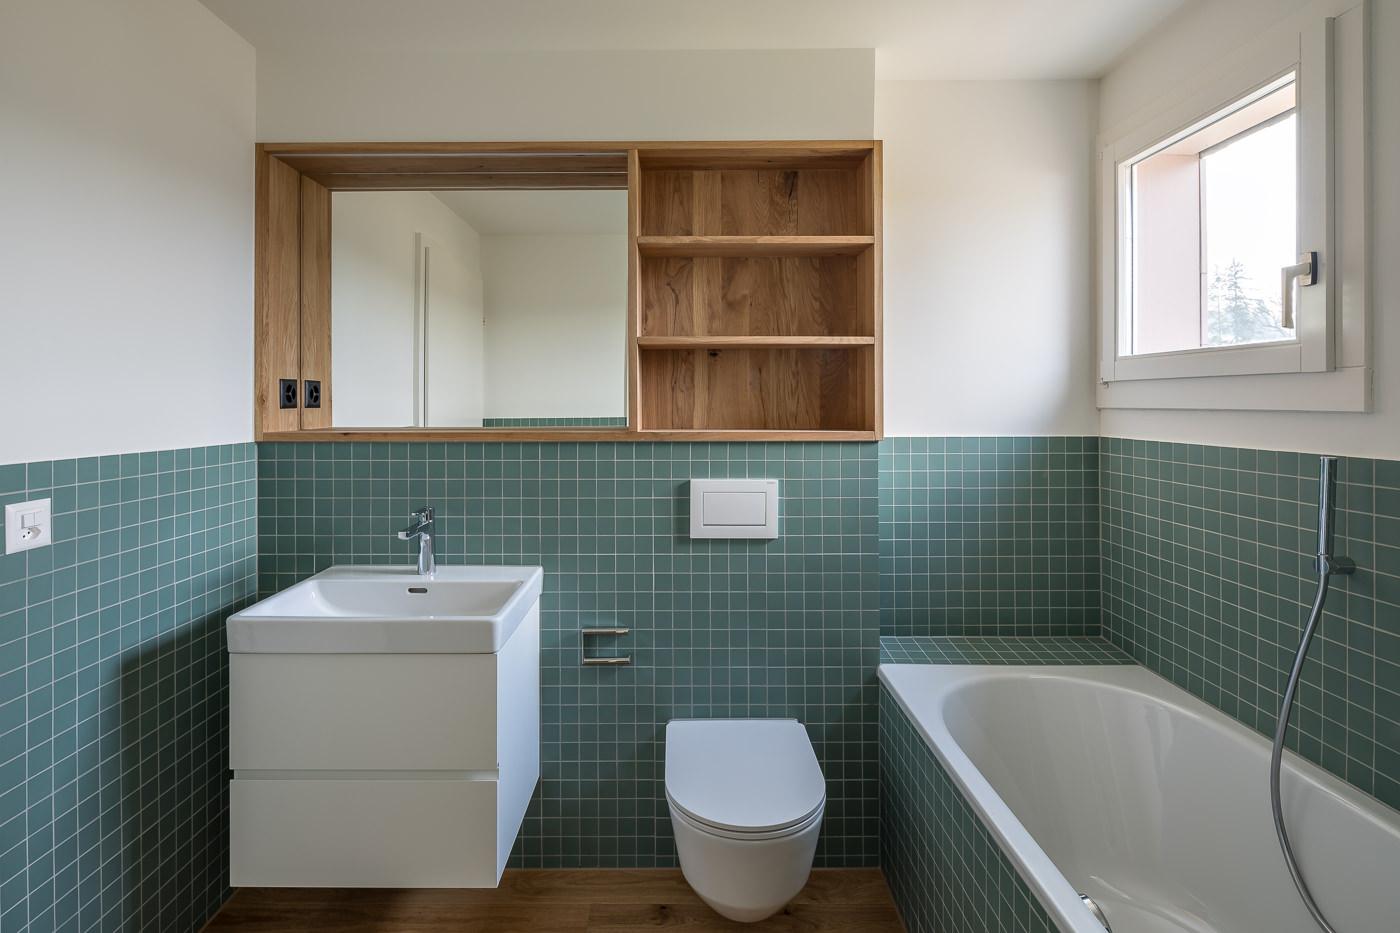 buan architekten – Umbau Attikawohnung Willisau – Foto – Bad gruen